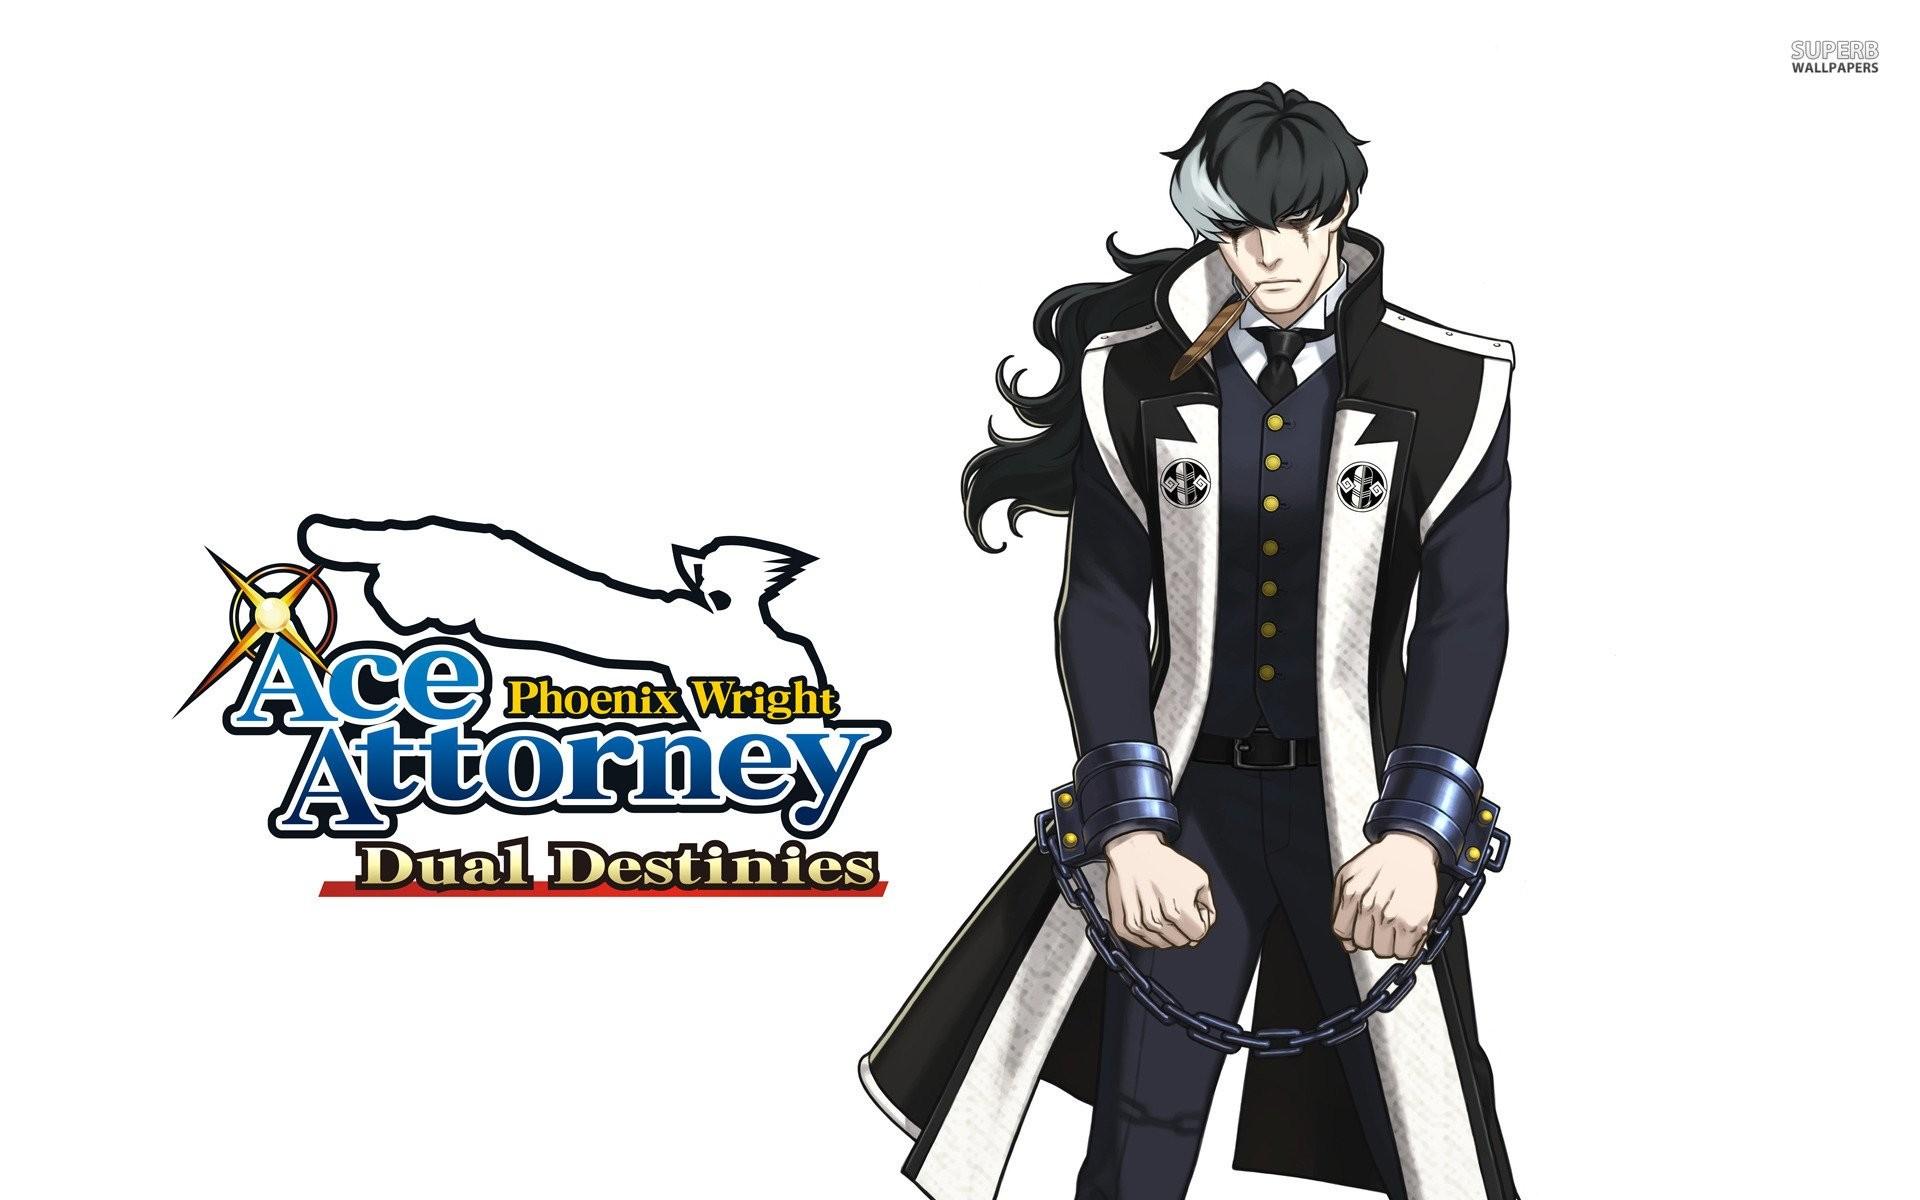 Phoenix Wright Ace Attorney – Dual Destinies